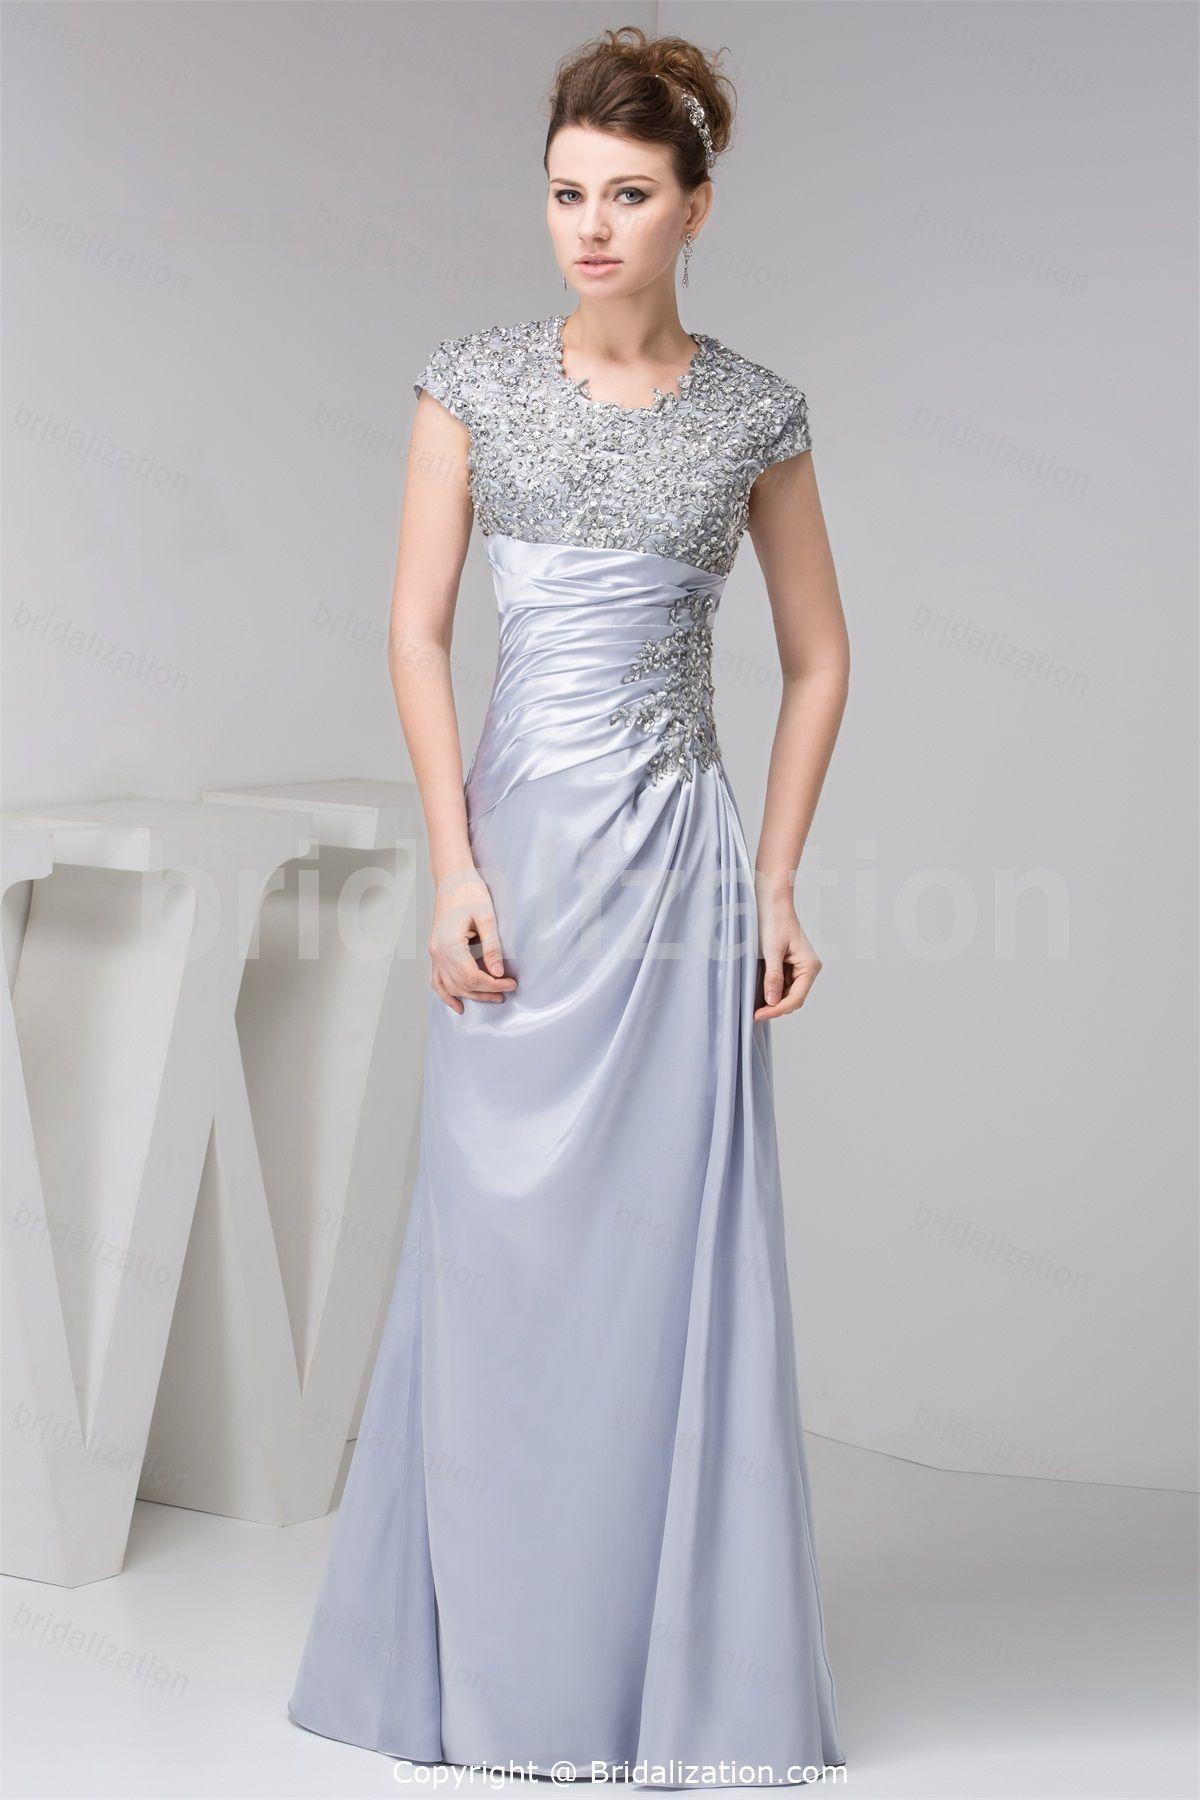 Junior Wedding Guest Dresses Charmeuse Dress Evening Dresses With Sleeves Evening Dresses [ 1800 x 1200 Pixel ]